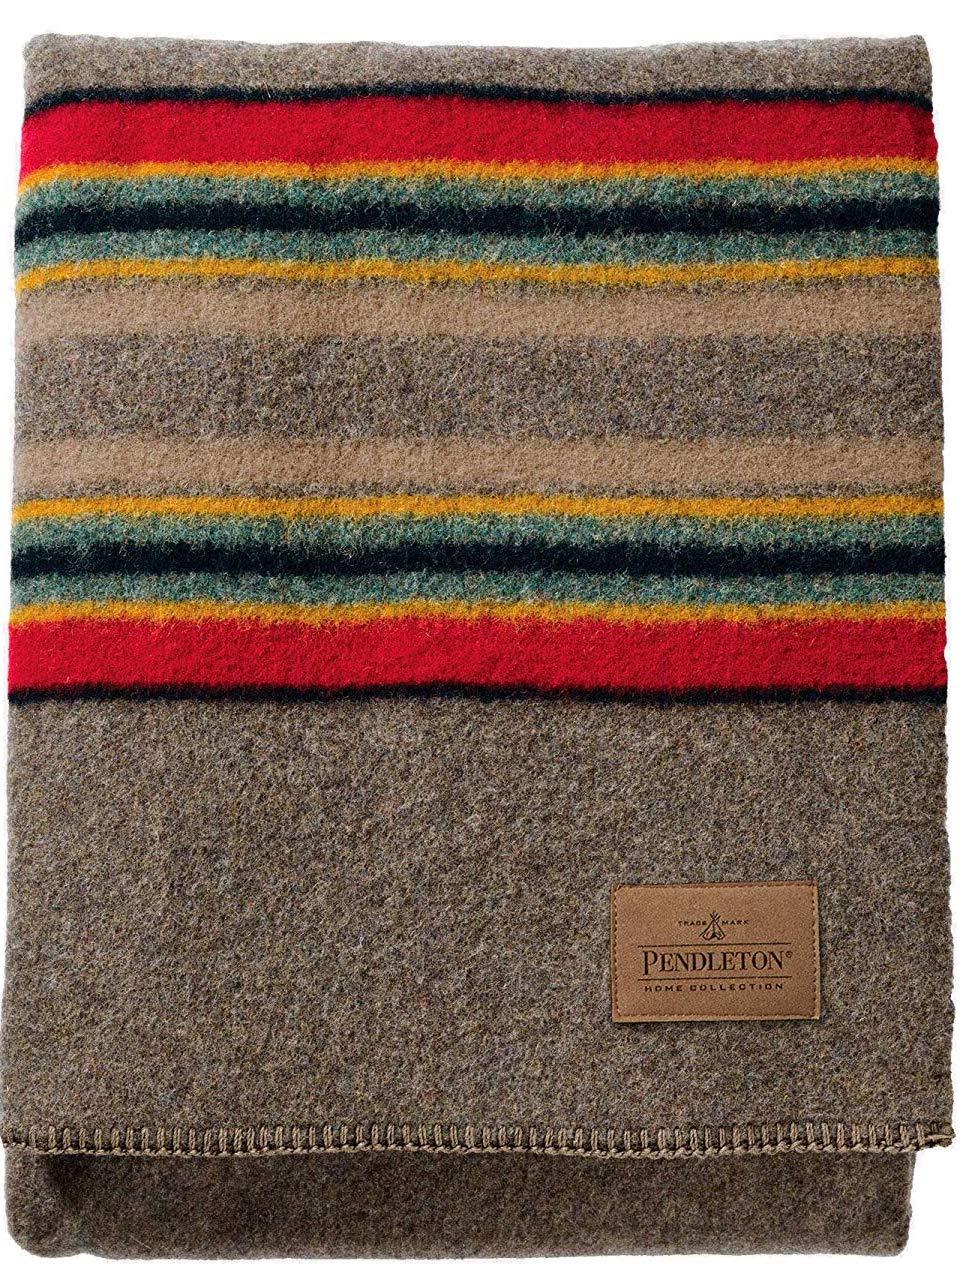 Pendleton Blanket.jpg